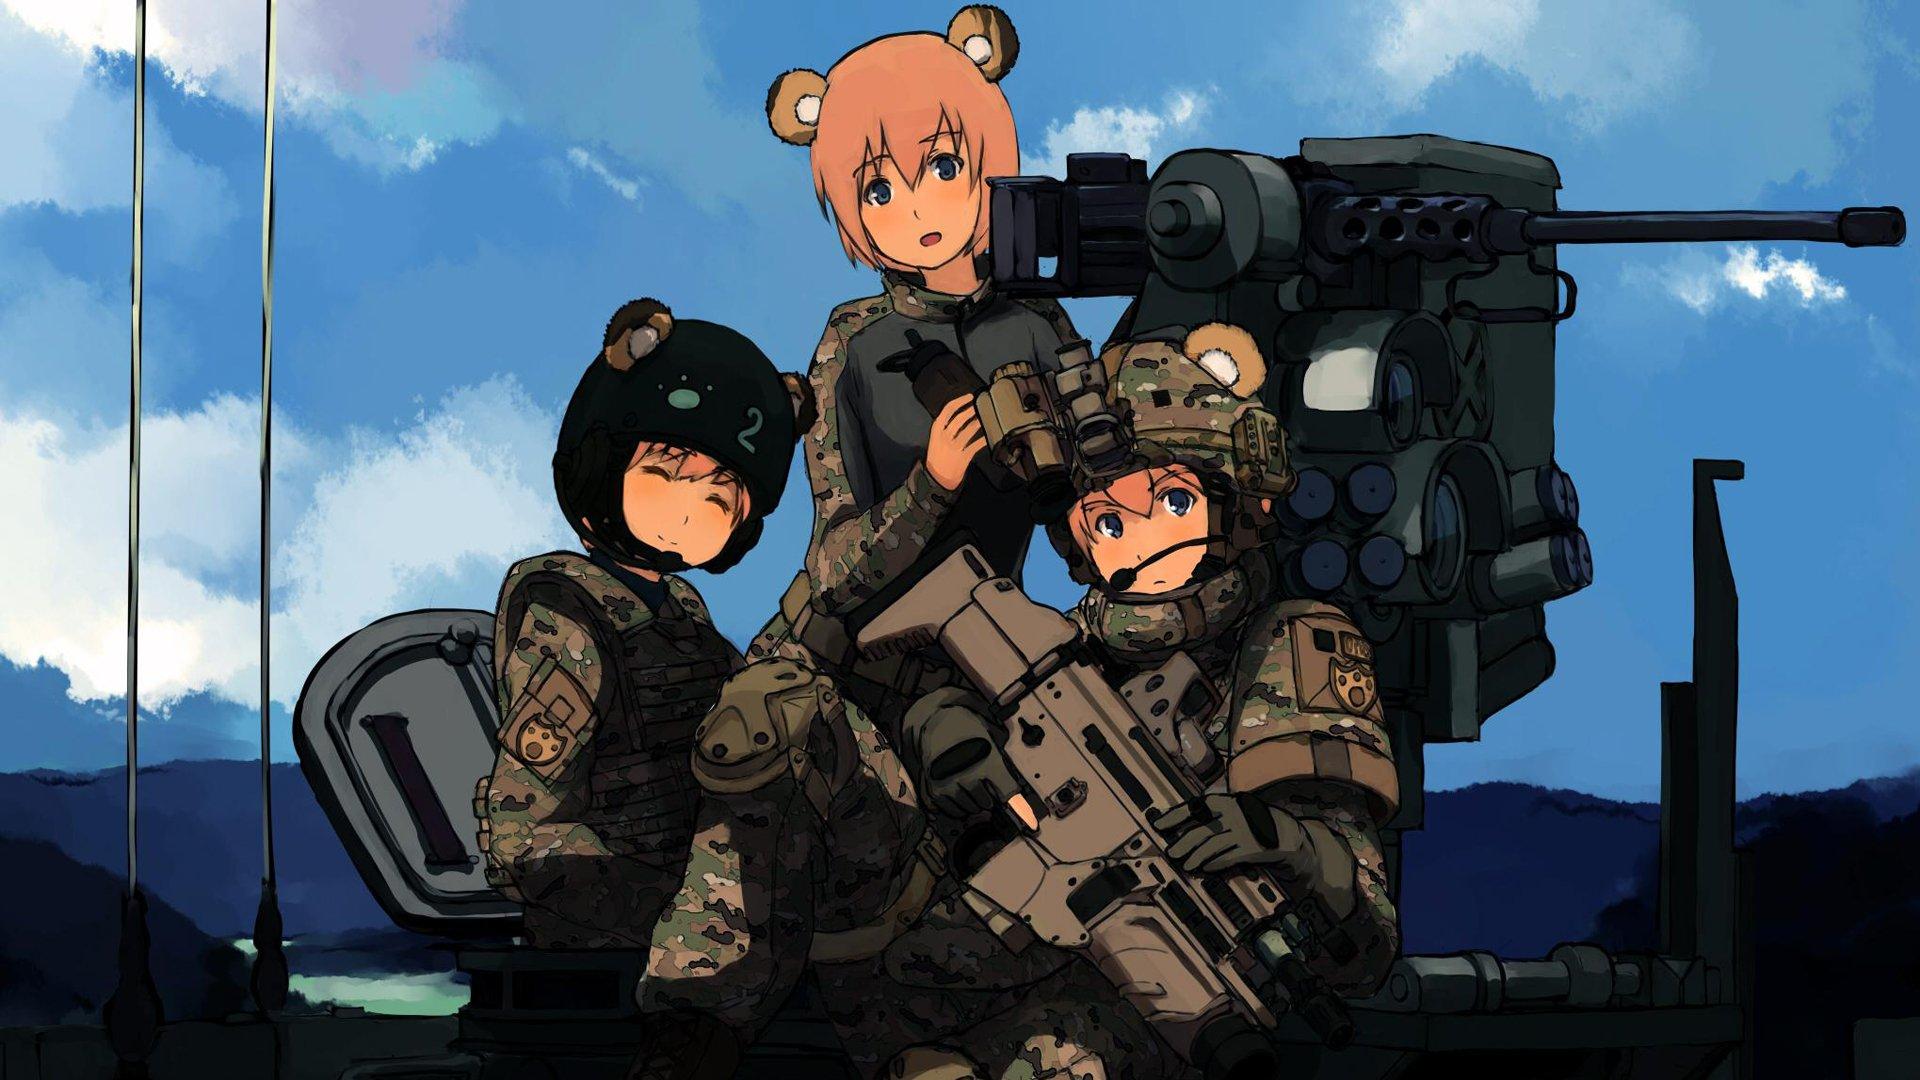 ... animal ears assault rifle anime girls SCAR-H wallpaper background